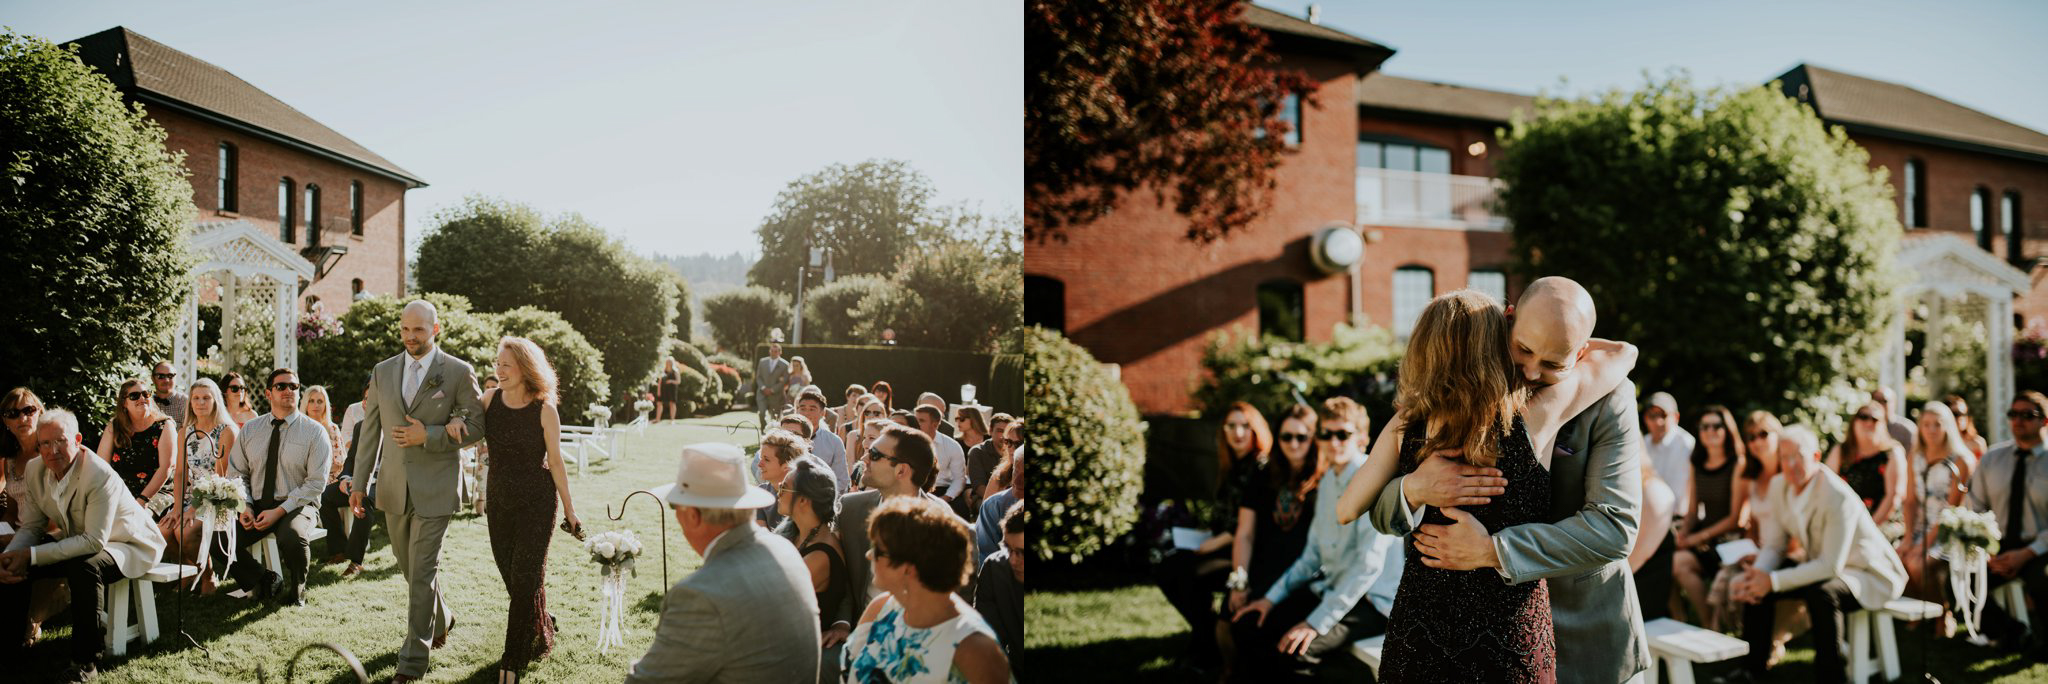 hollywood-school-house-wedding-seattle-photographer-caitlyn-nikula-66.jpg